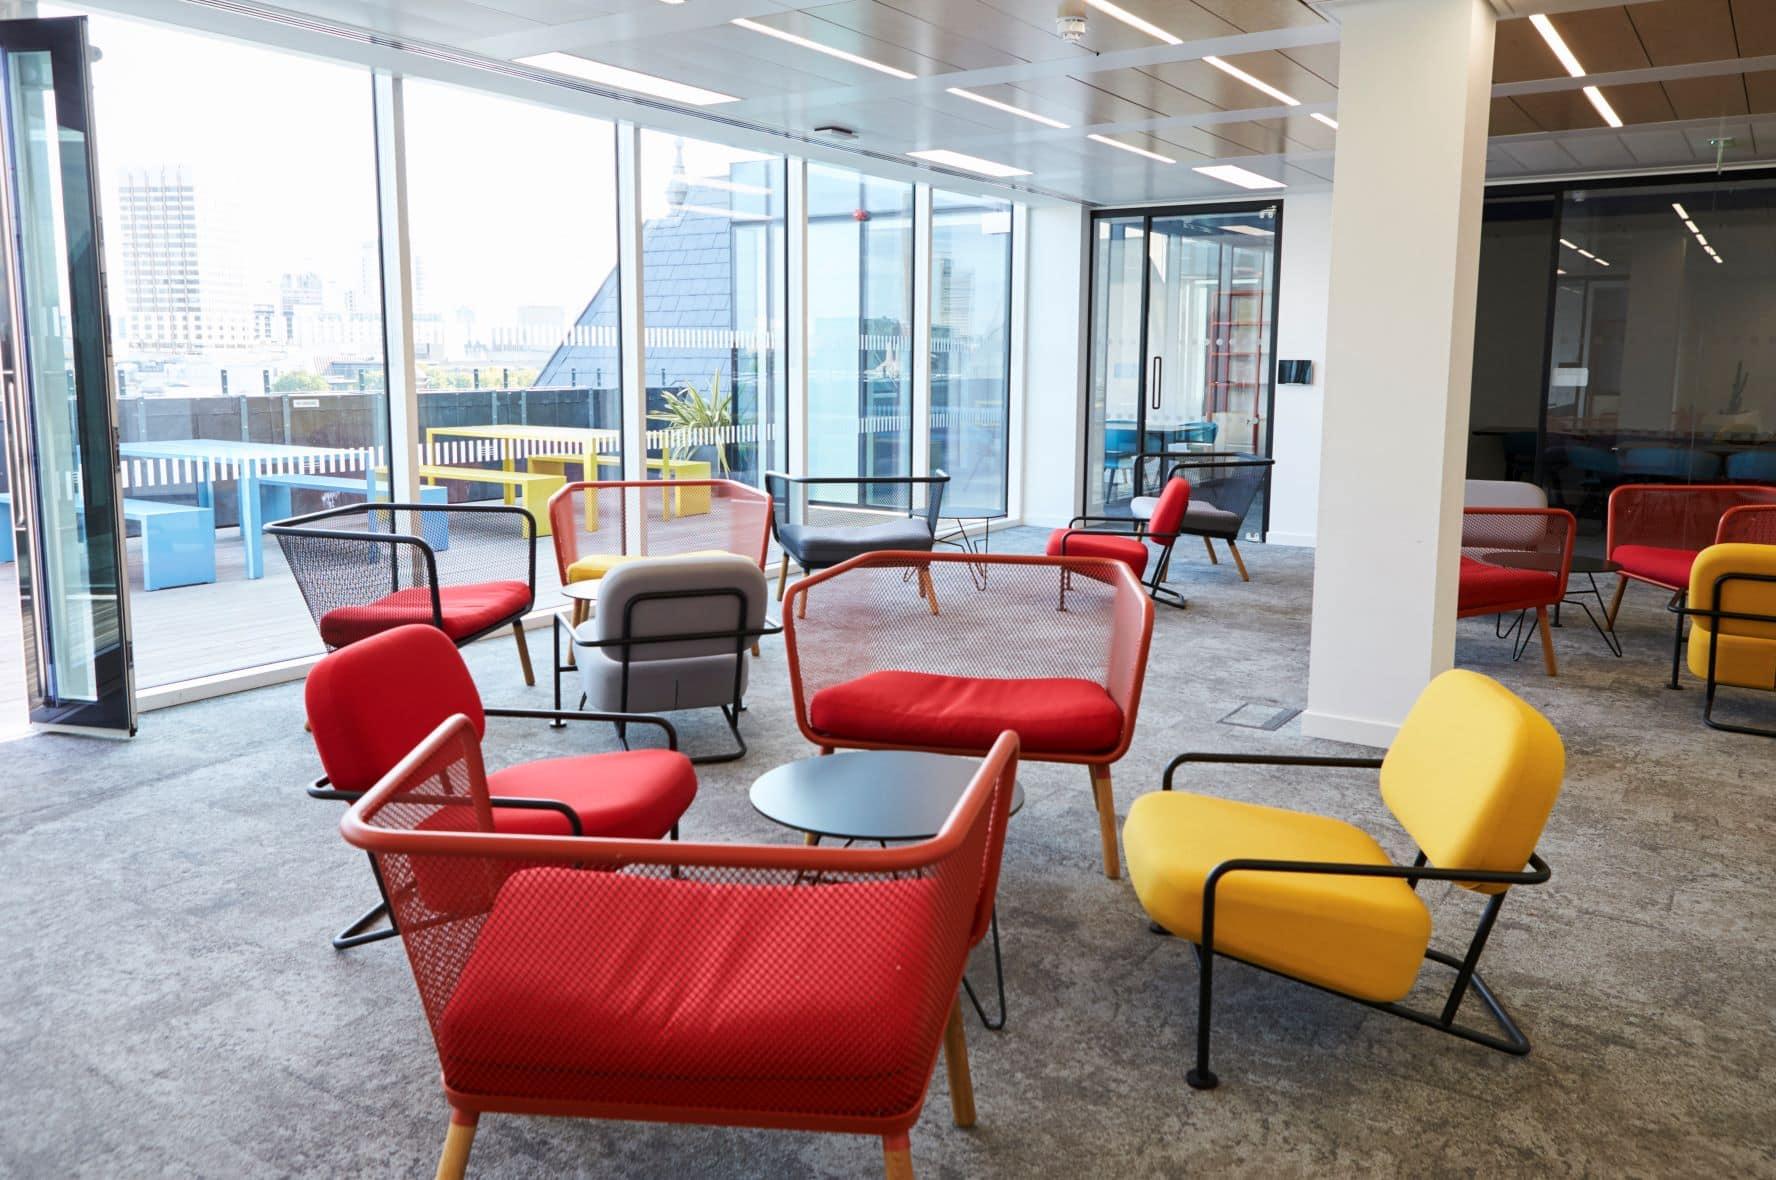 How Does Break Room Design Benefit Productivity?